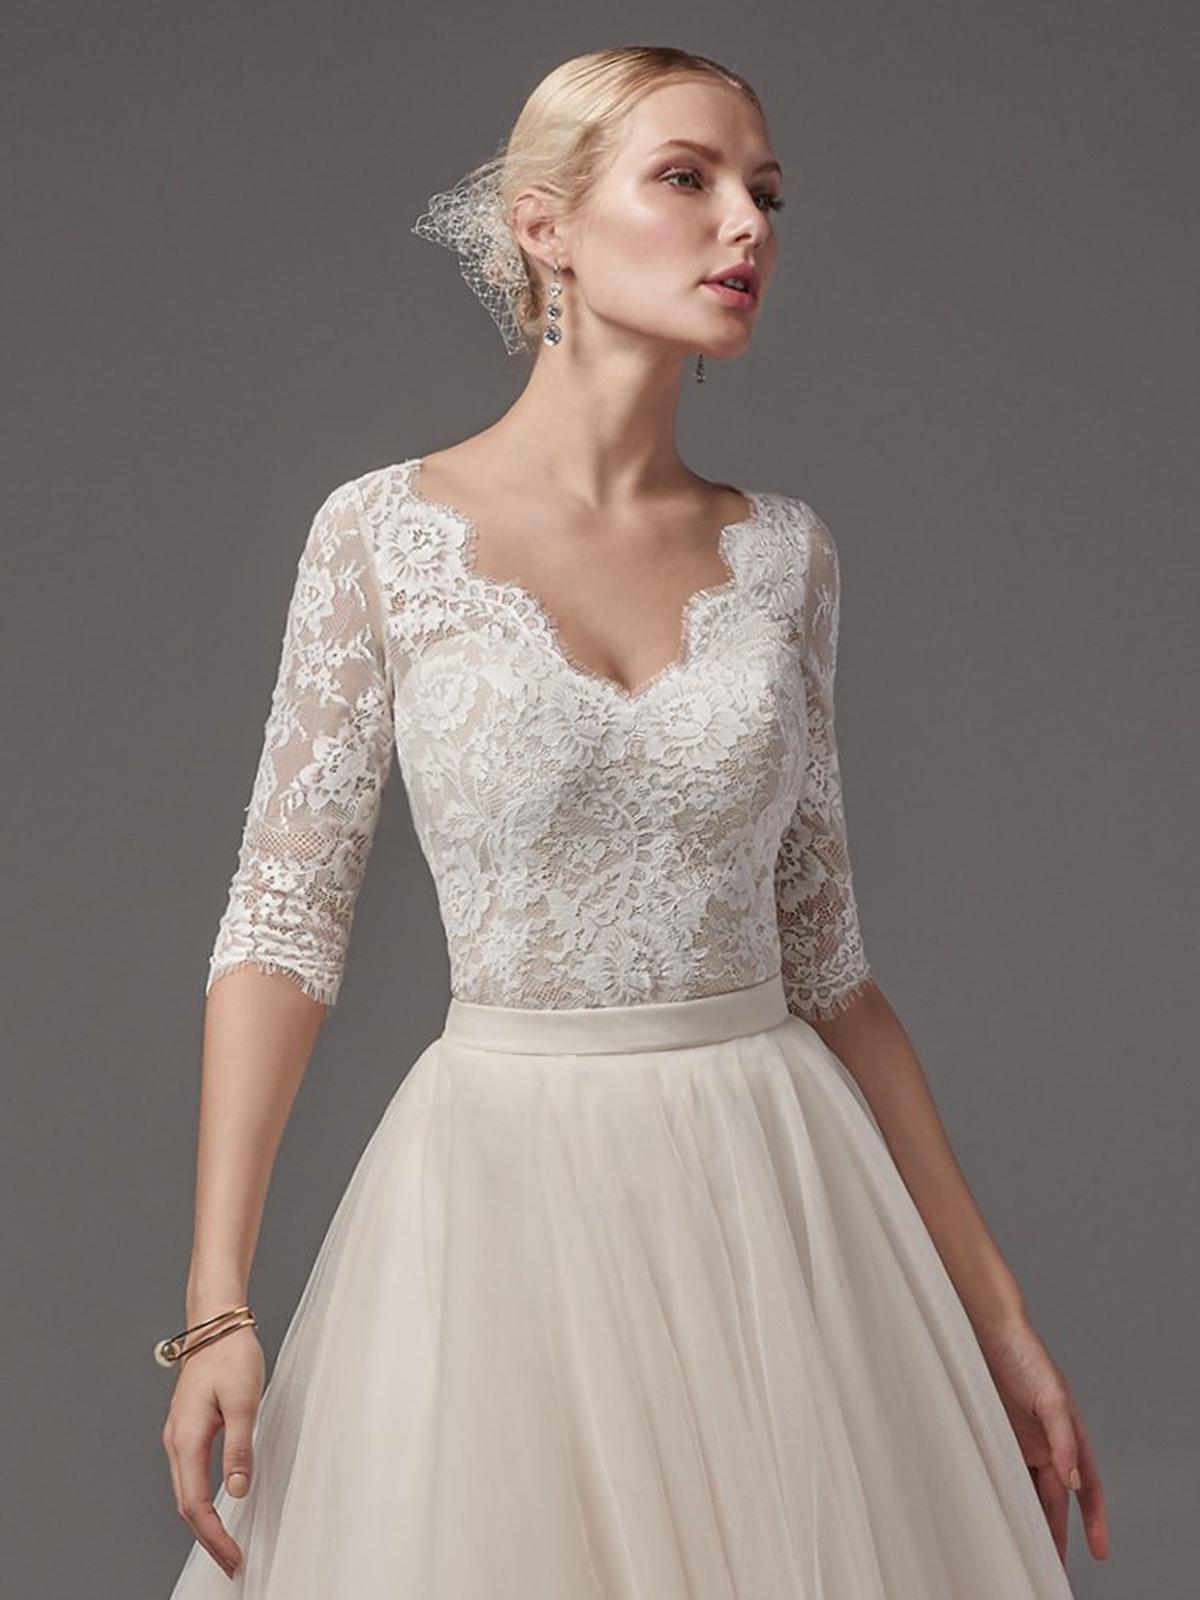 Skvostný model z novej kolekcie! body KENSINGTON + sukňa KALLIN - Kensington + Kallin